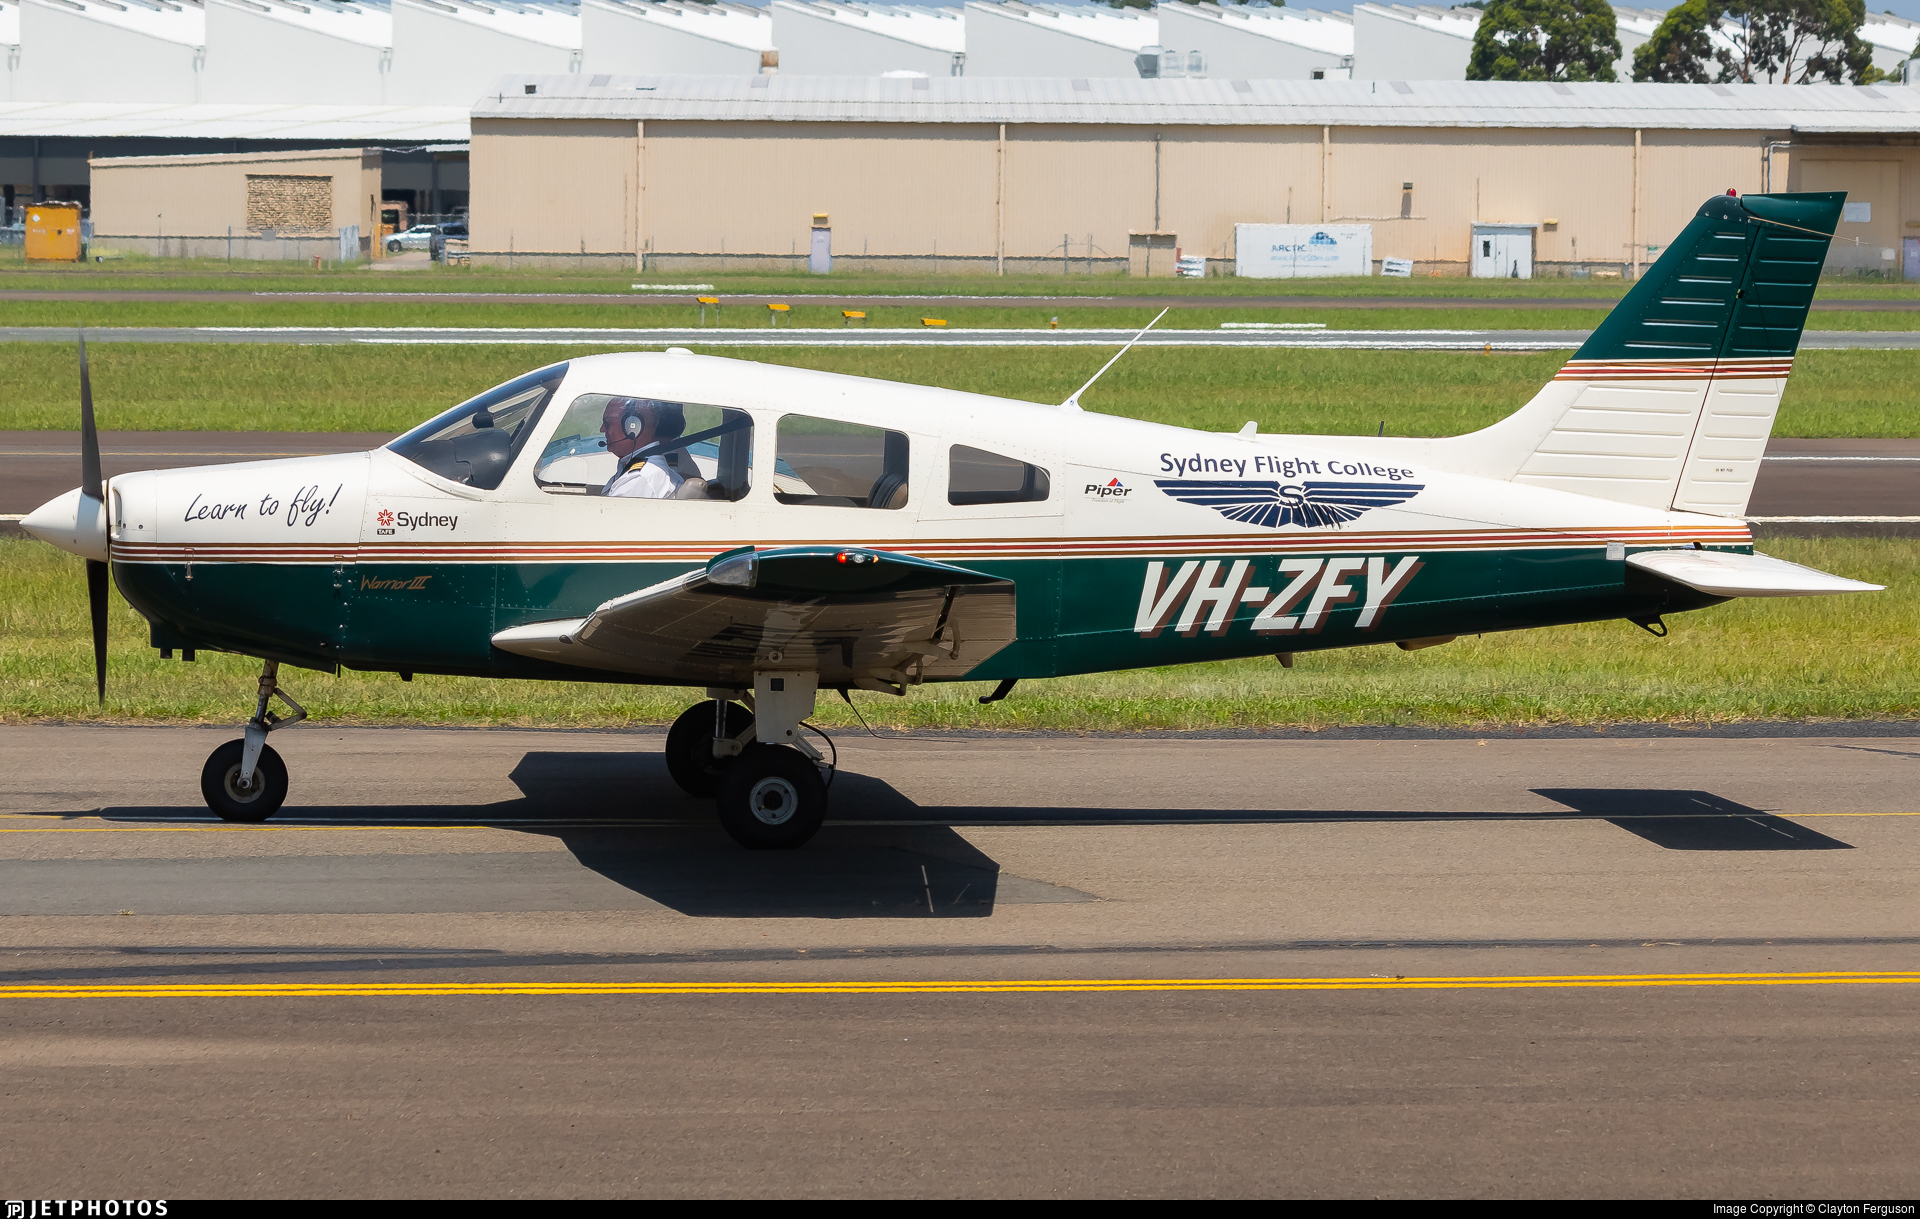 VH-ZFY - Piper PA-28-161 Warrior III - Schofields Flying Club